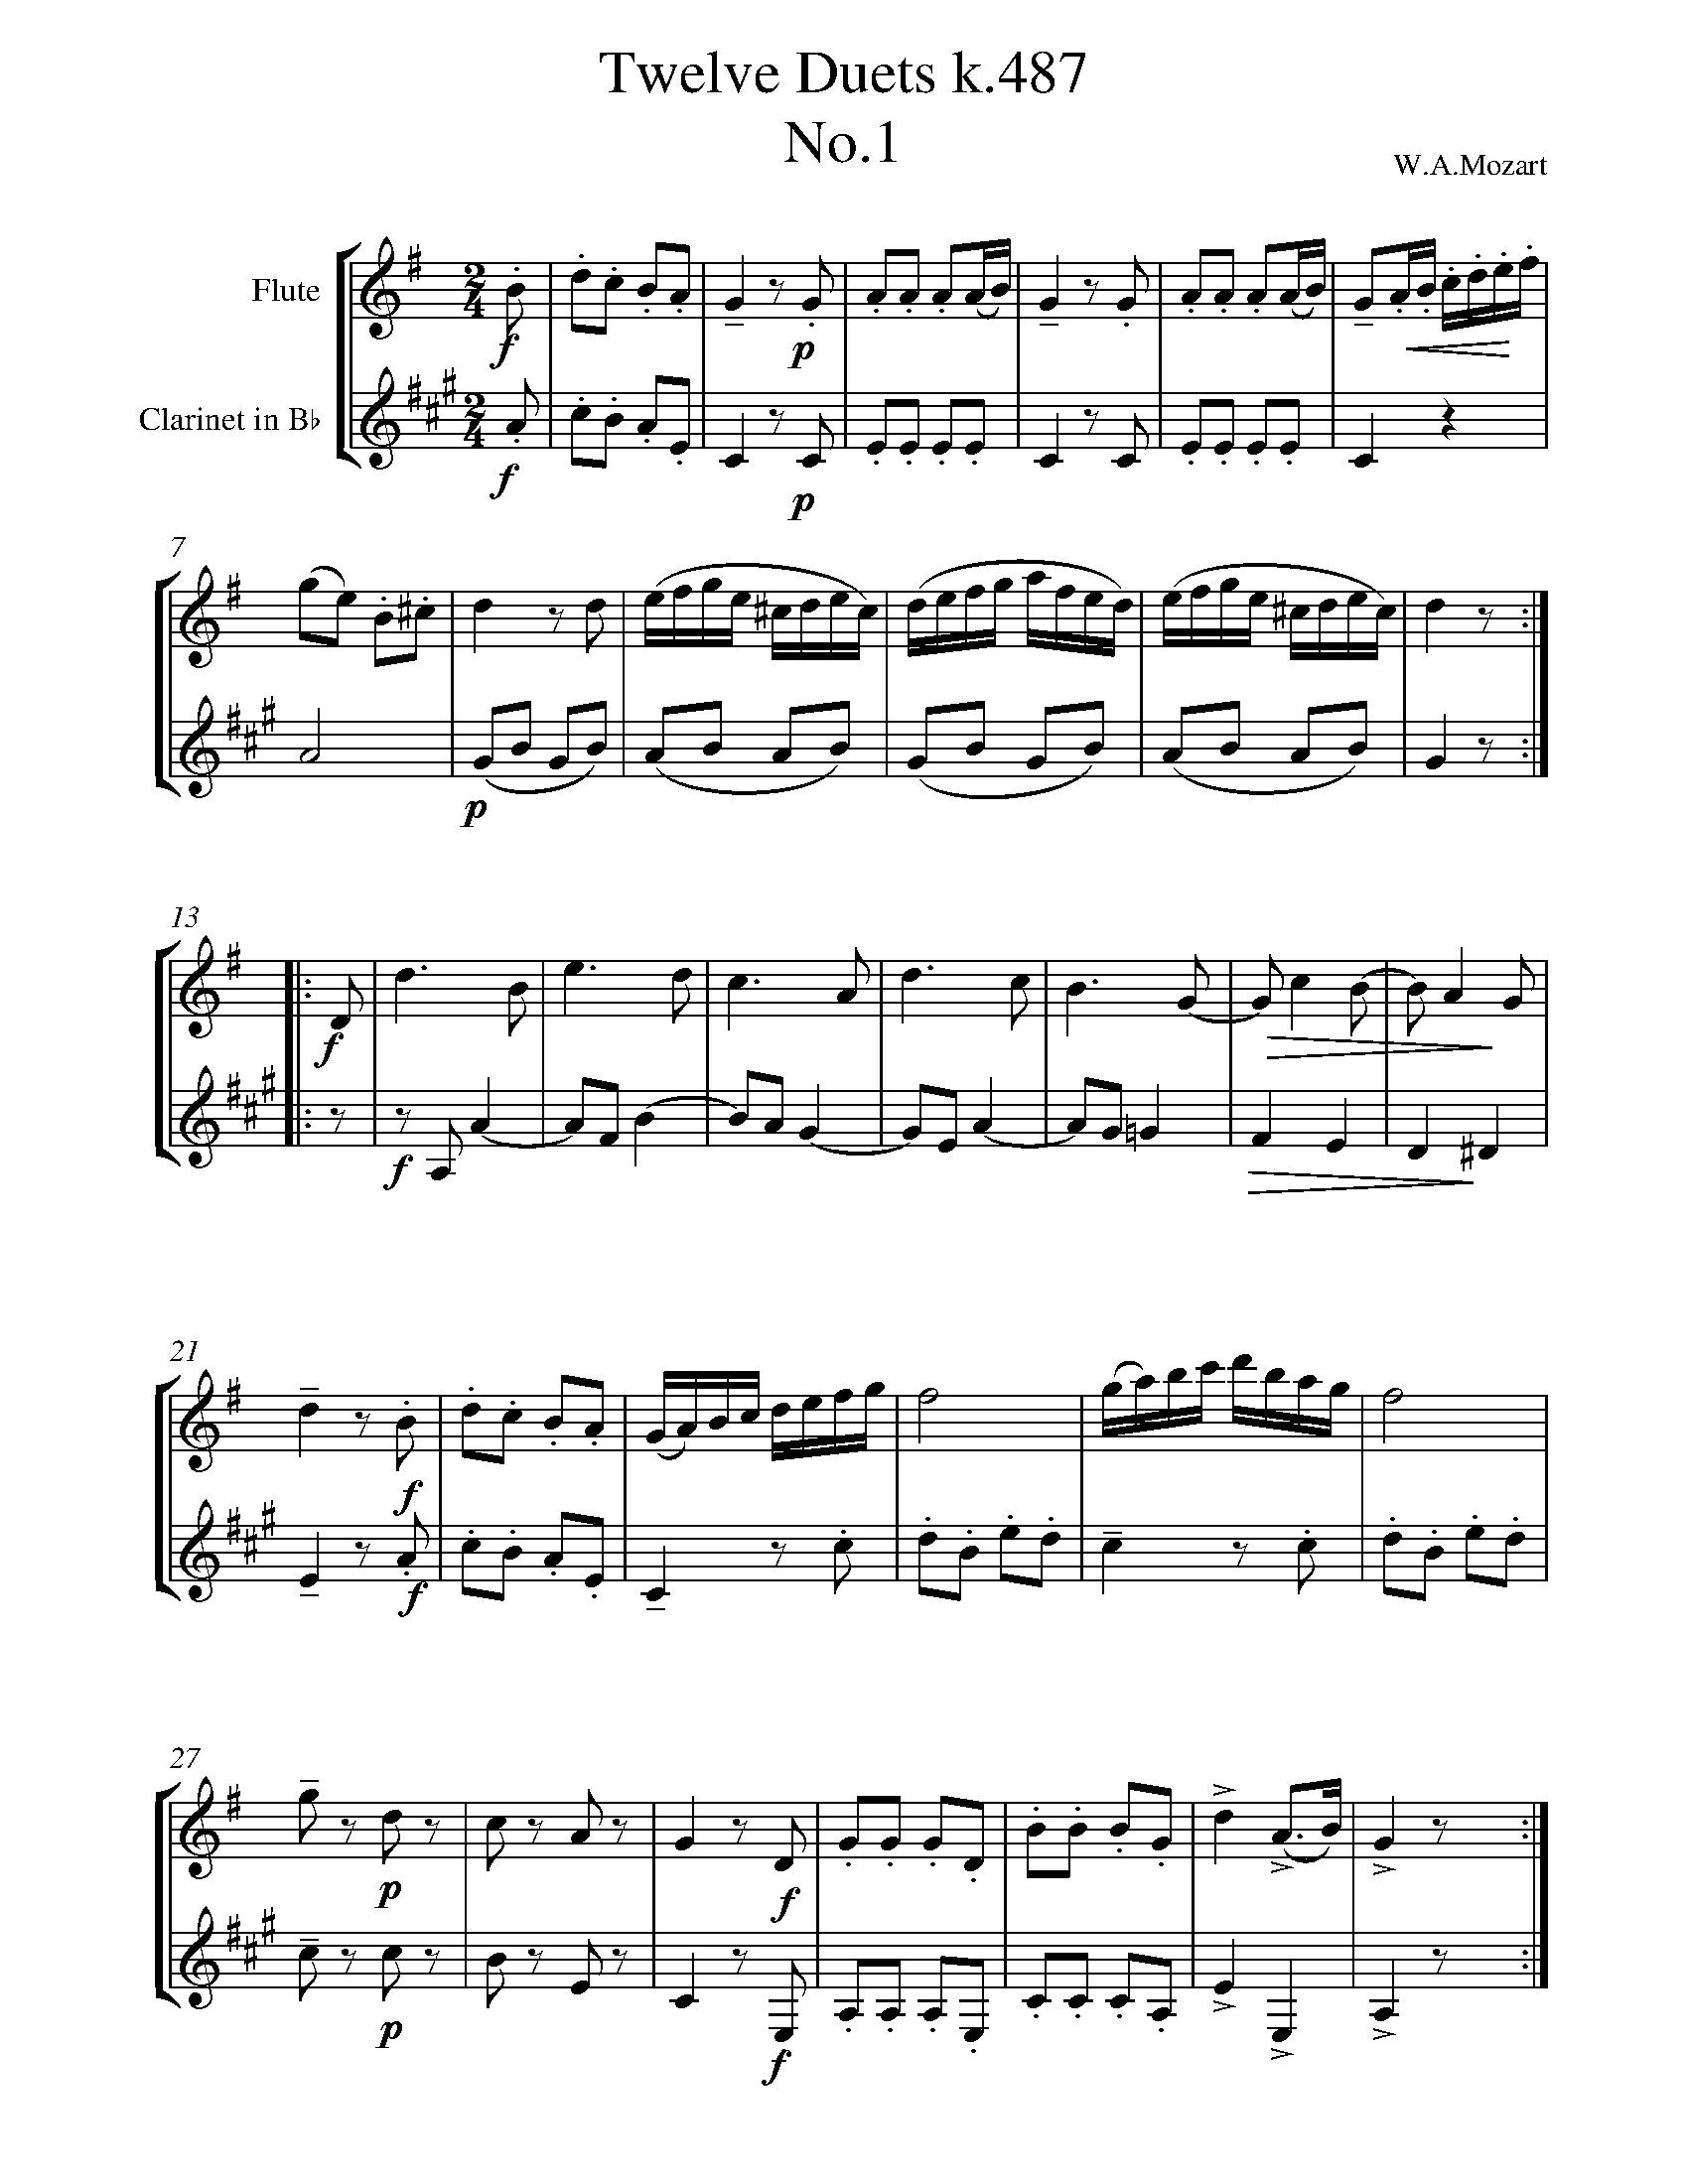 mozart - twelve duets k.487 no.1 sheet music for flute-clarinet duet -  8notes.com  8notes